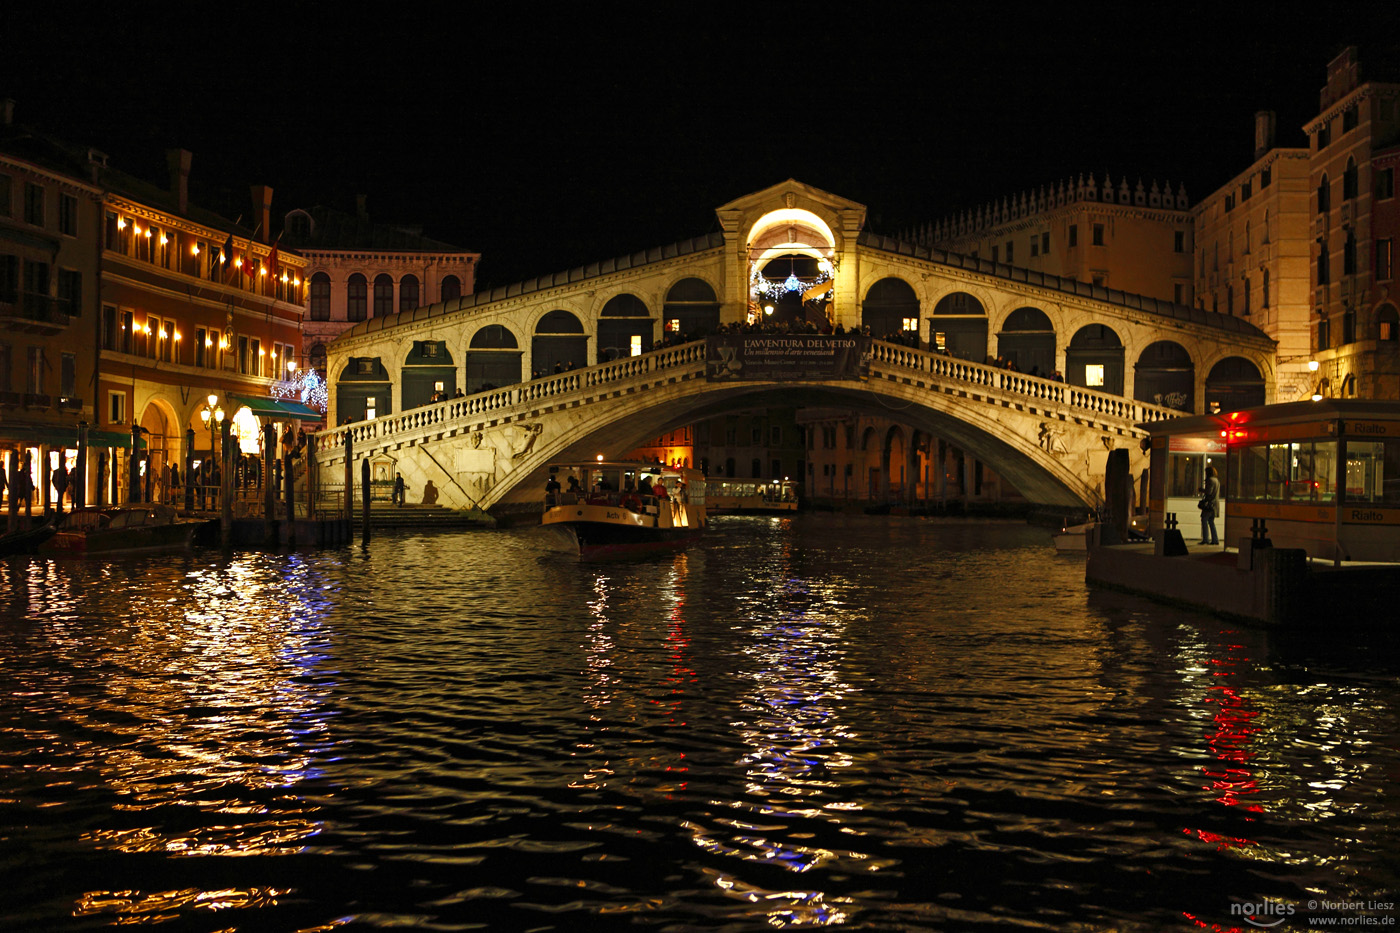 Nachts an der Rialto Brücke